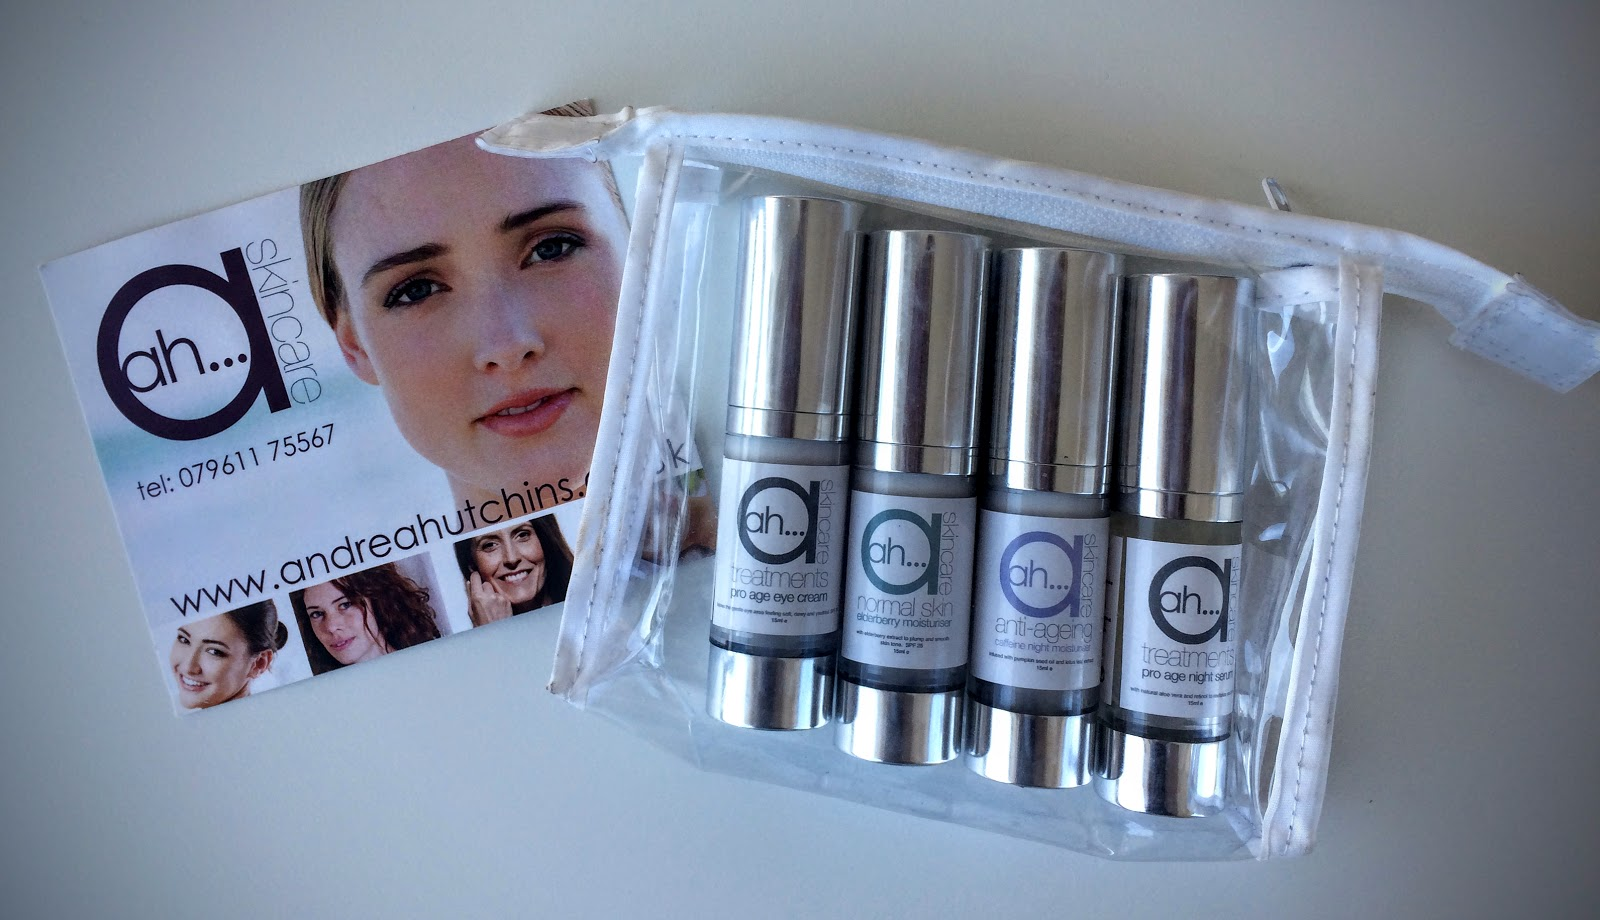 AH Skincare Caffeine night cream, Elderberry moisturiser, Prp age eye area, pro age night serum